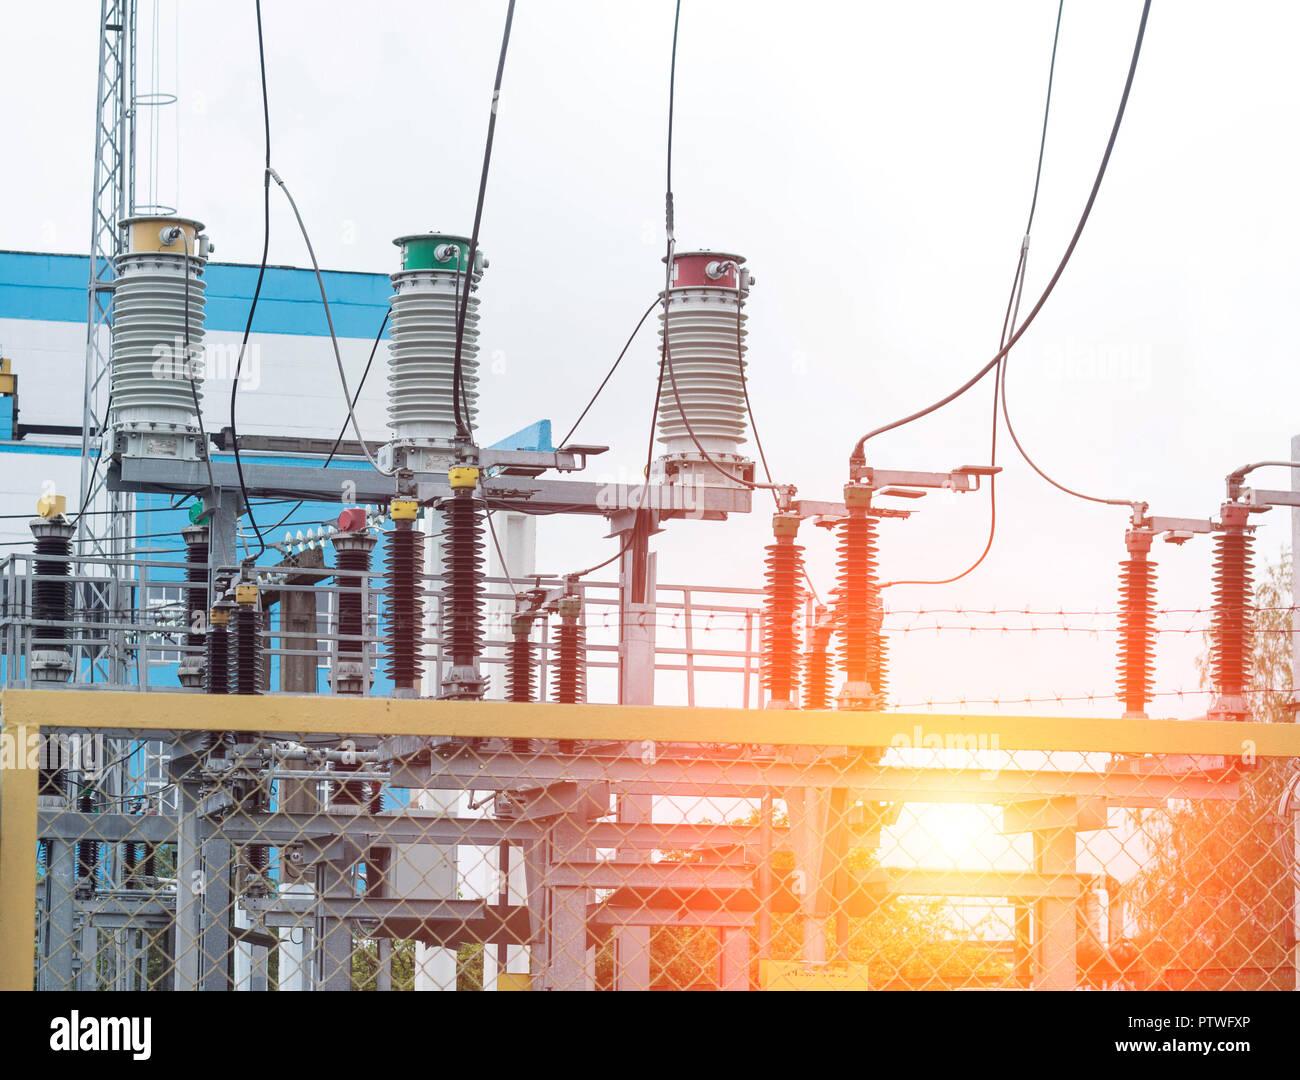 Power transformer in high voltage switchyard in modern